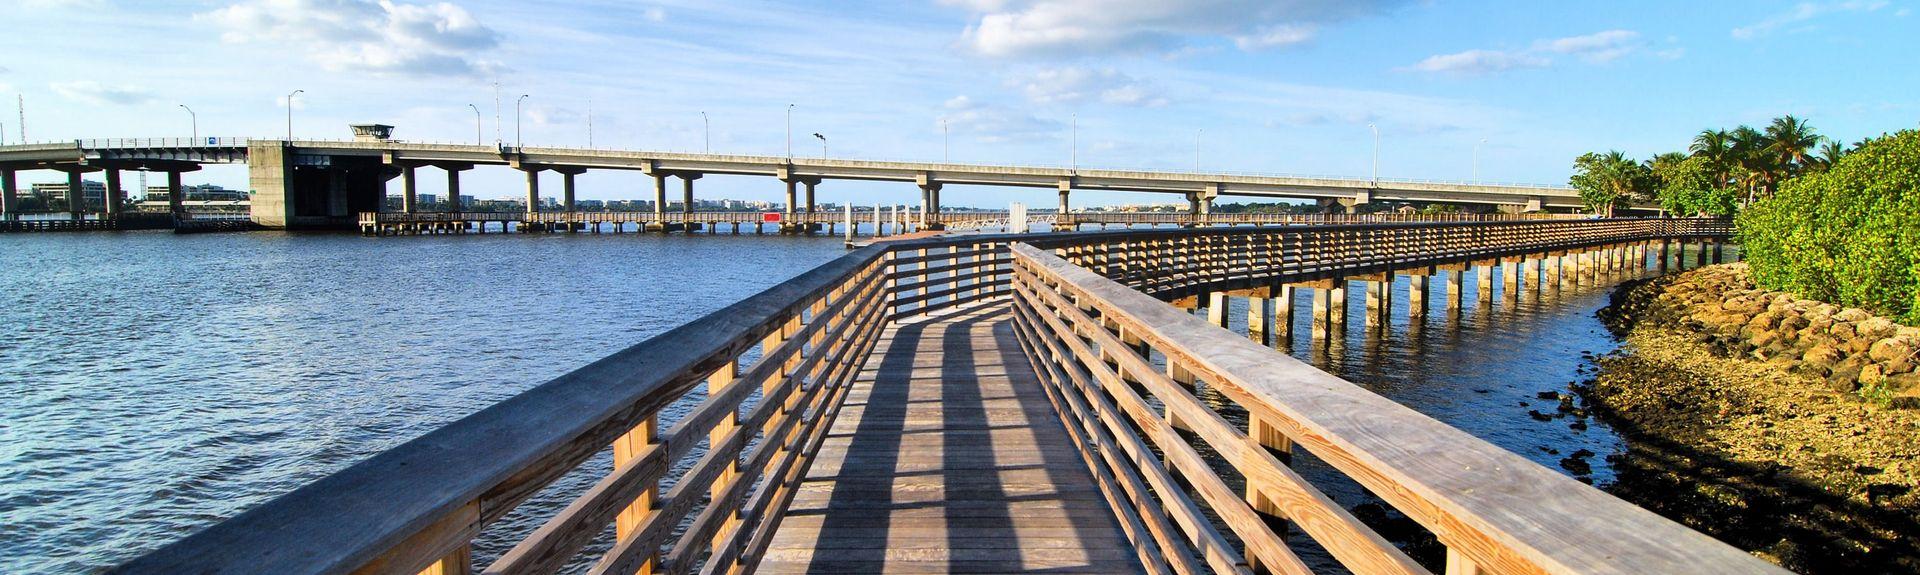 Lake Worth, Florida, United States of America